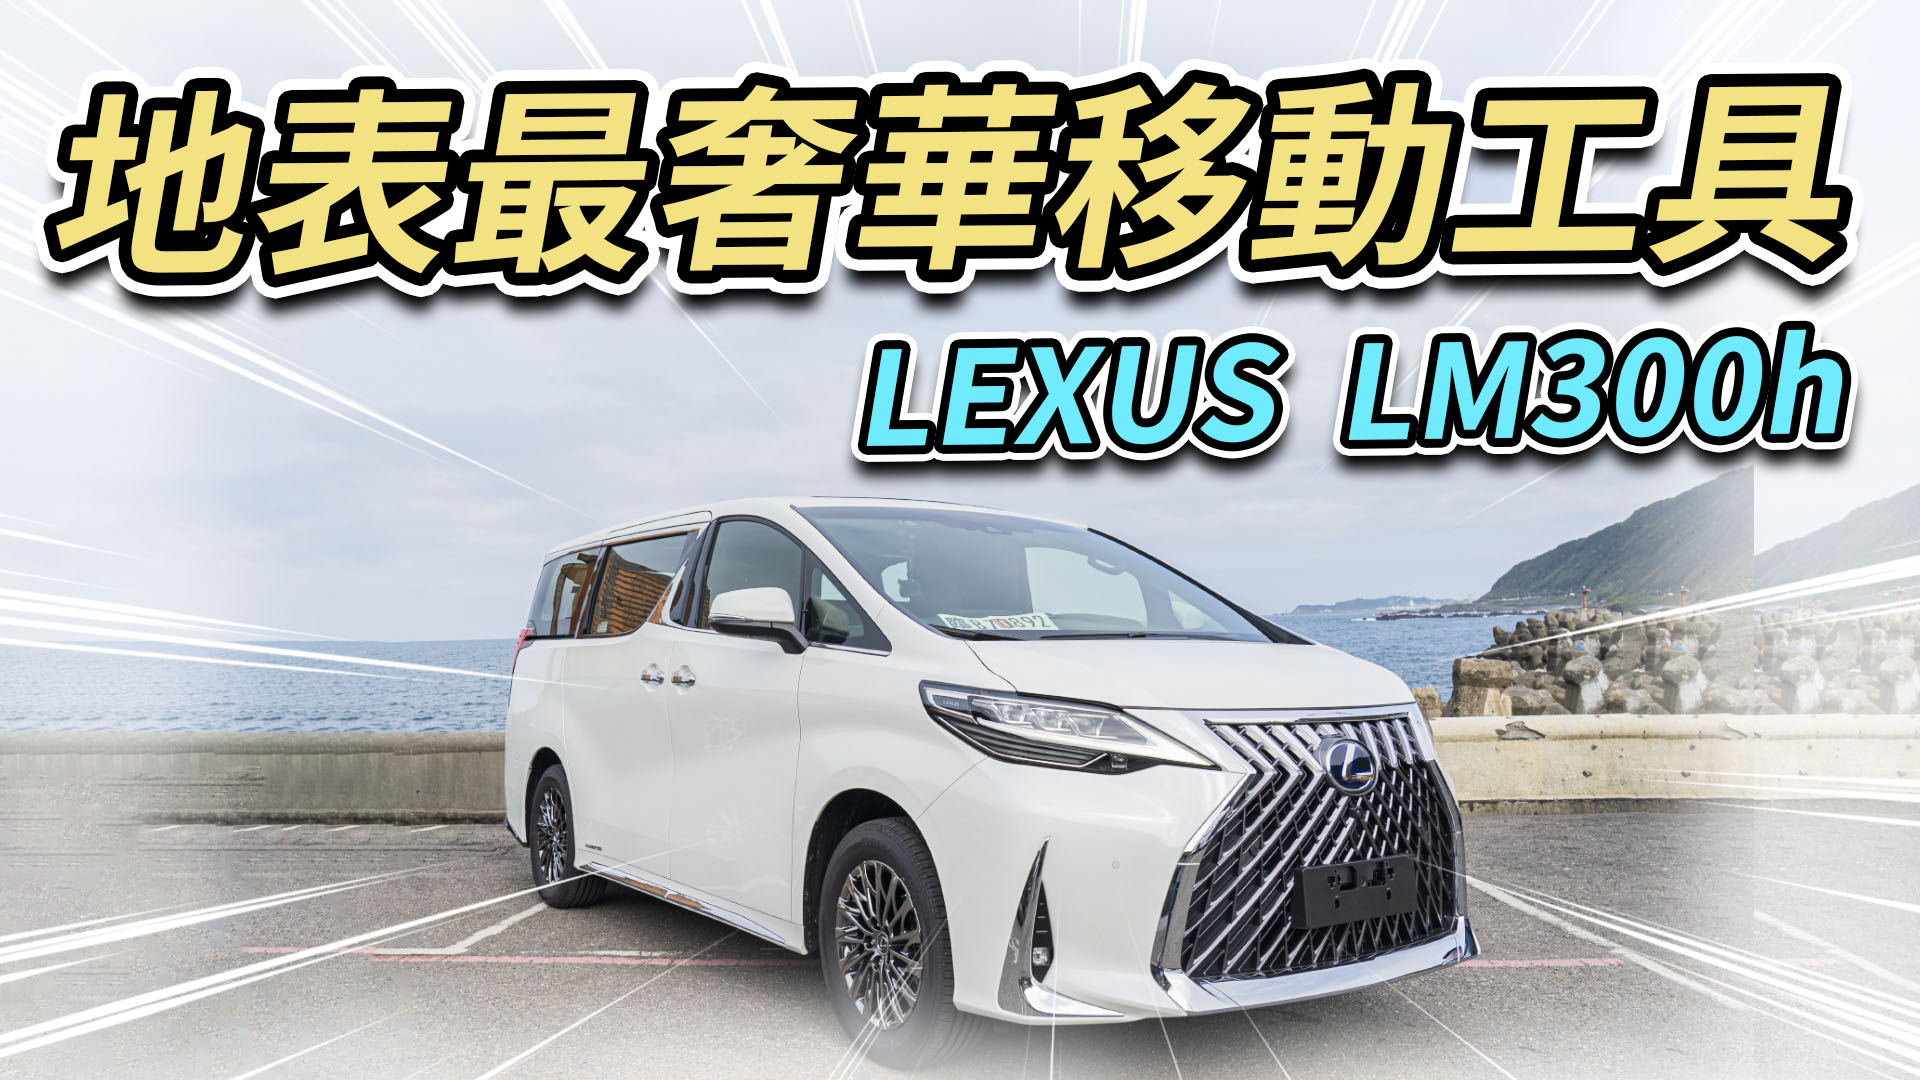 【Andy老爹/Money錢毅試駕】地表最奢華移動工具 LEXUS LM300h